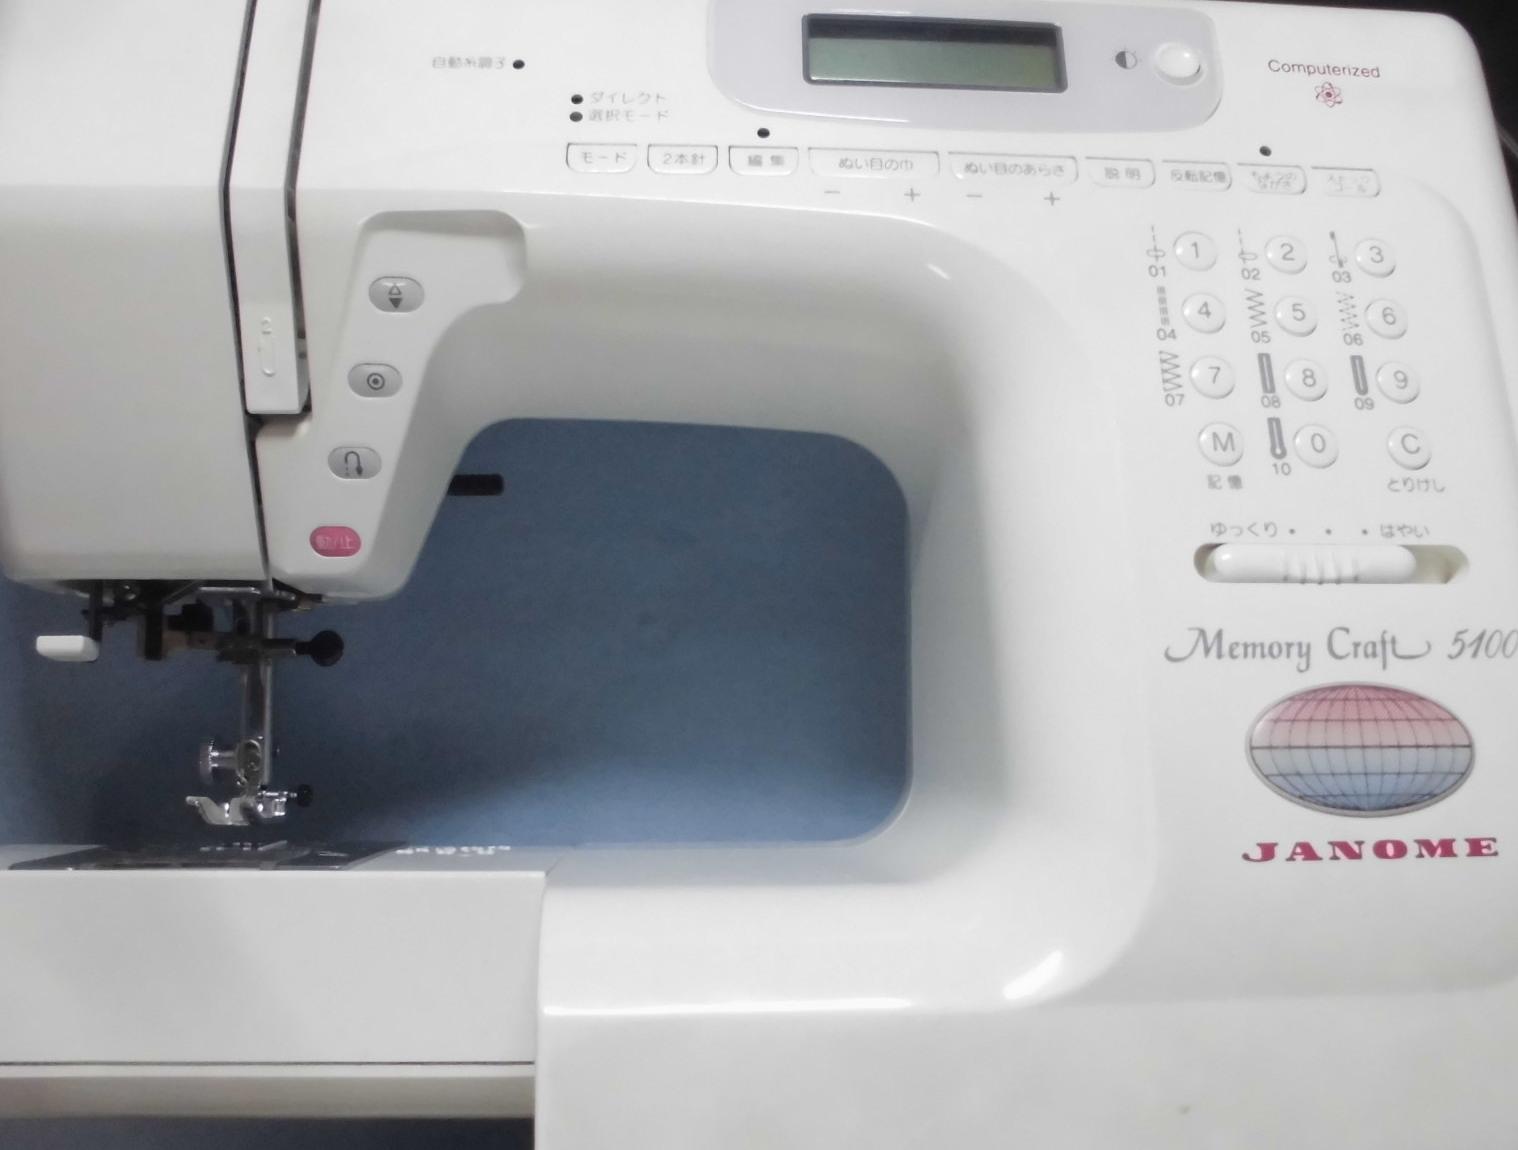 JANOMEミシン修理|MemoryCraft5100|布を正常に送らない不具合・ミシンの固着